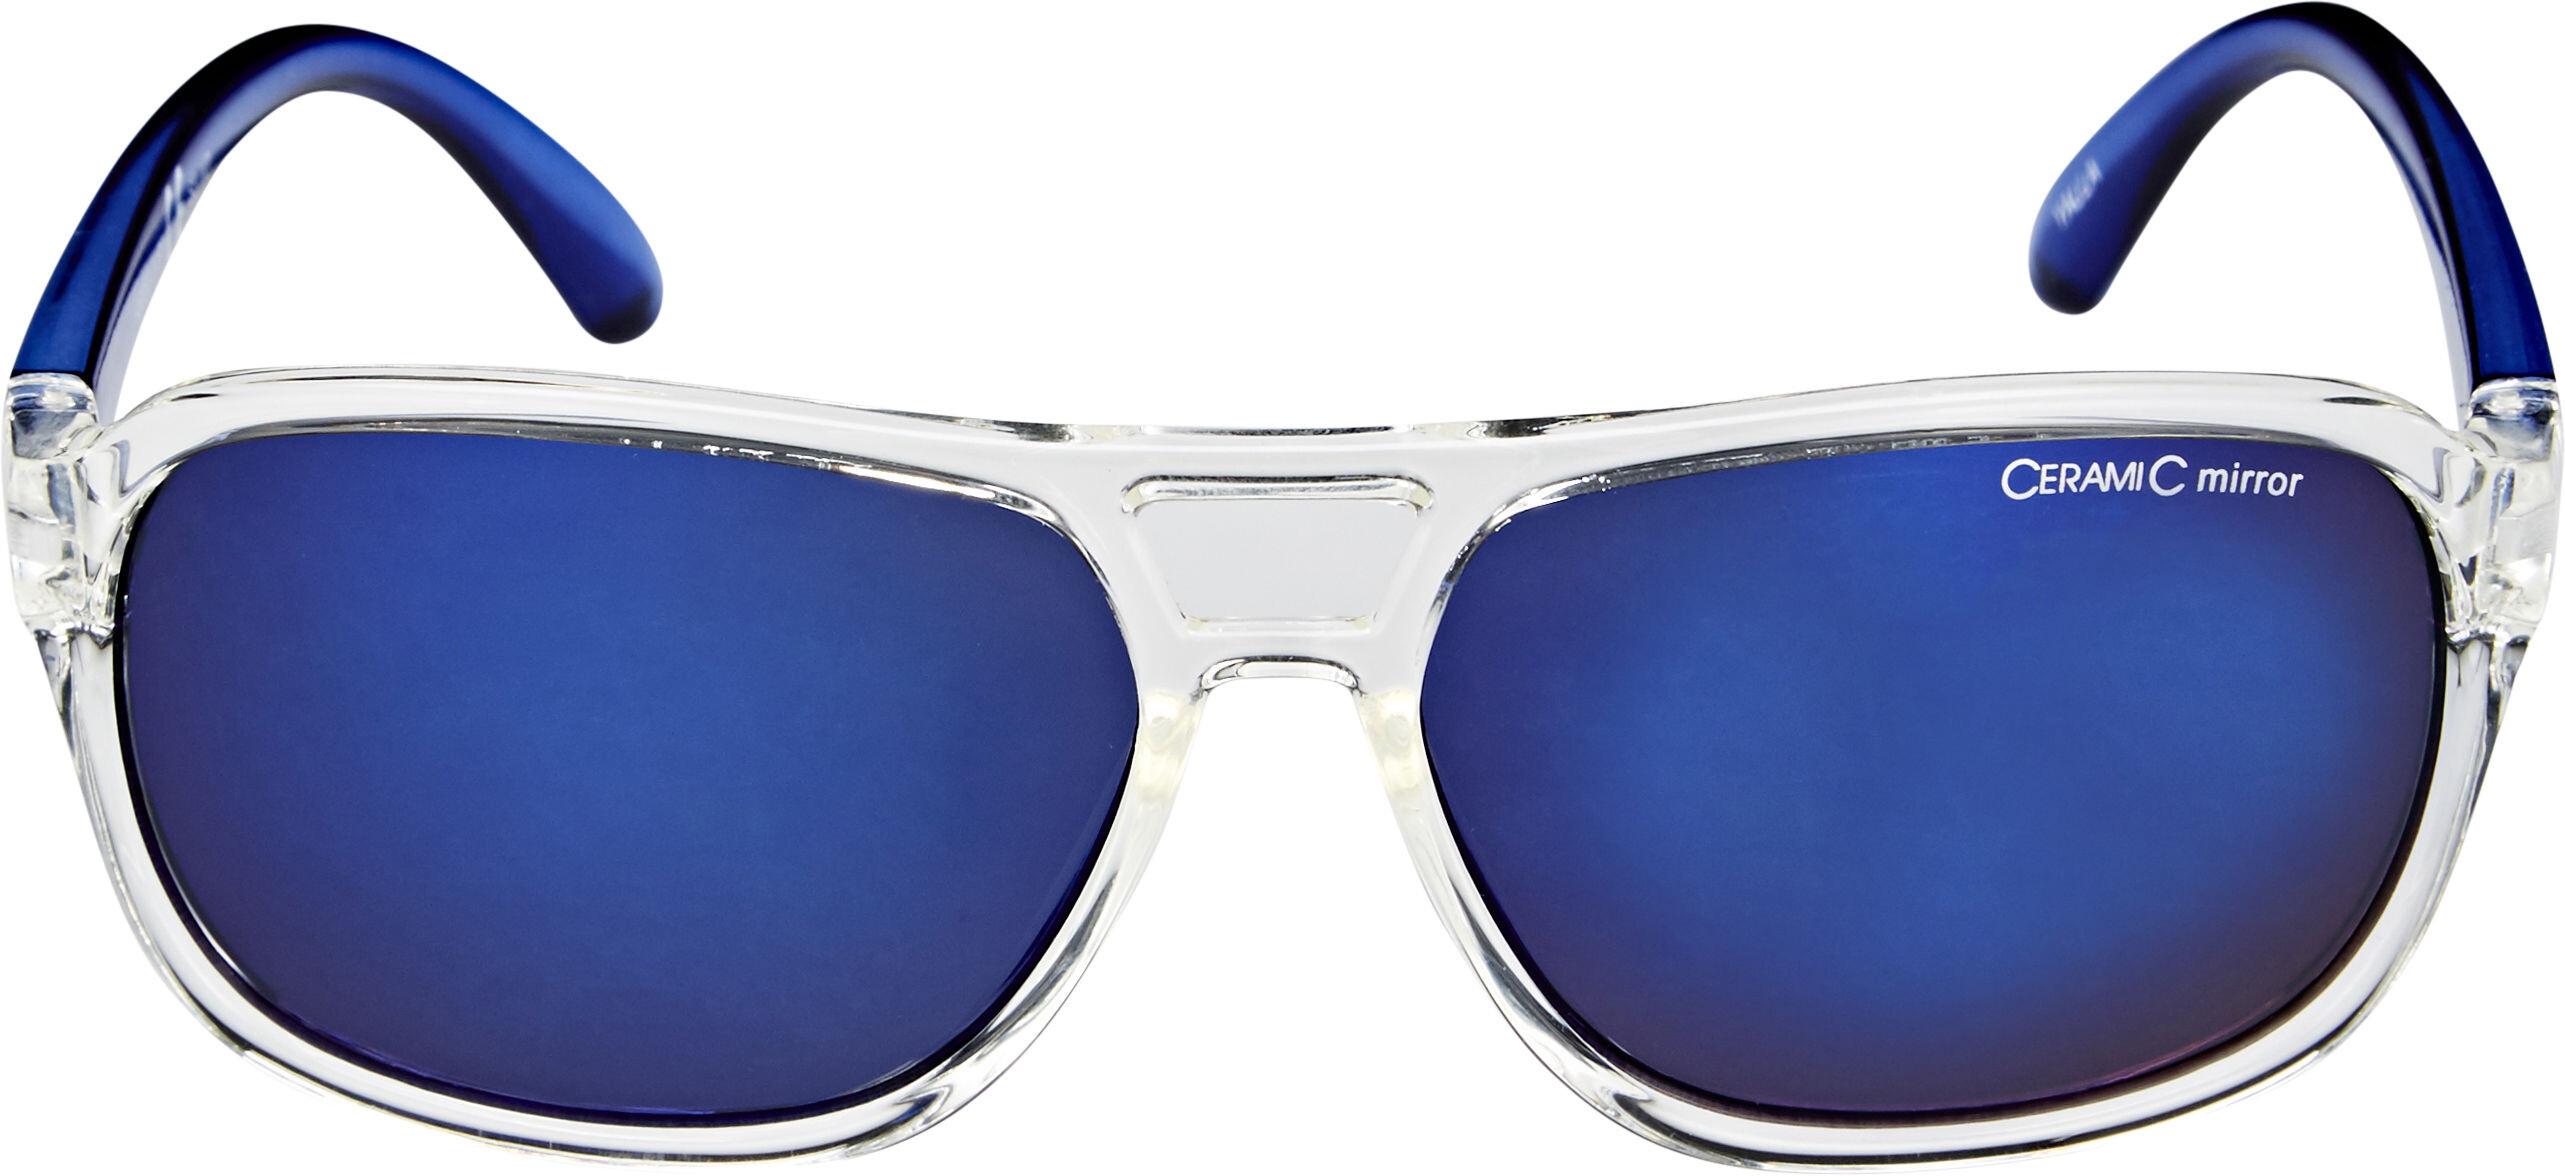 5cbd79cf20a7 Alpina Yalla Cykelbriller Børn blå gennemsigtig